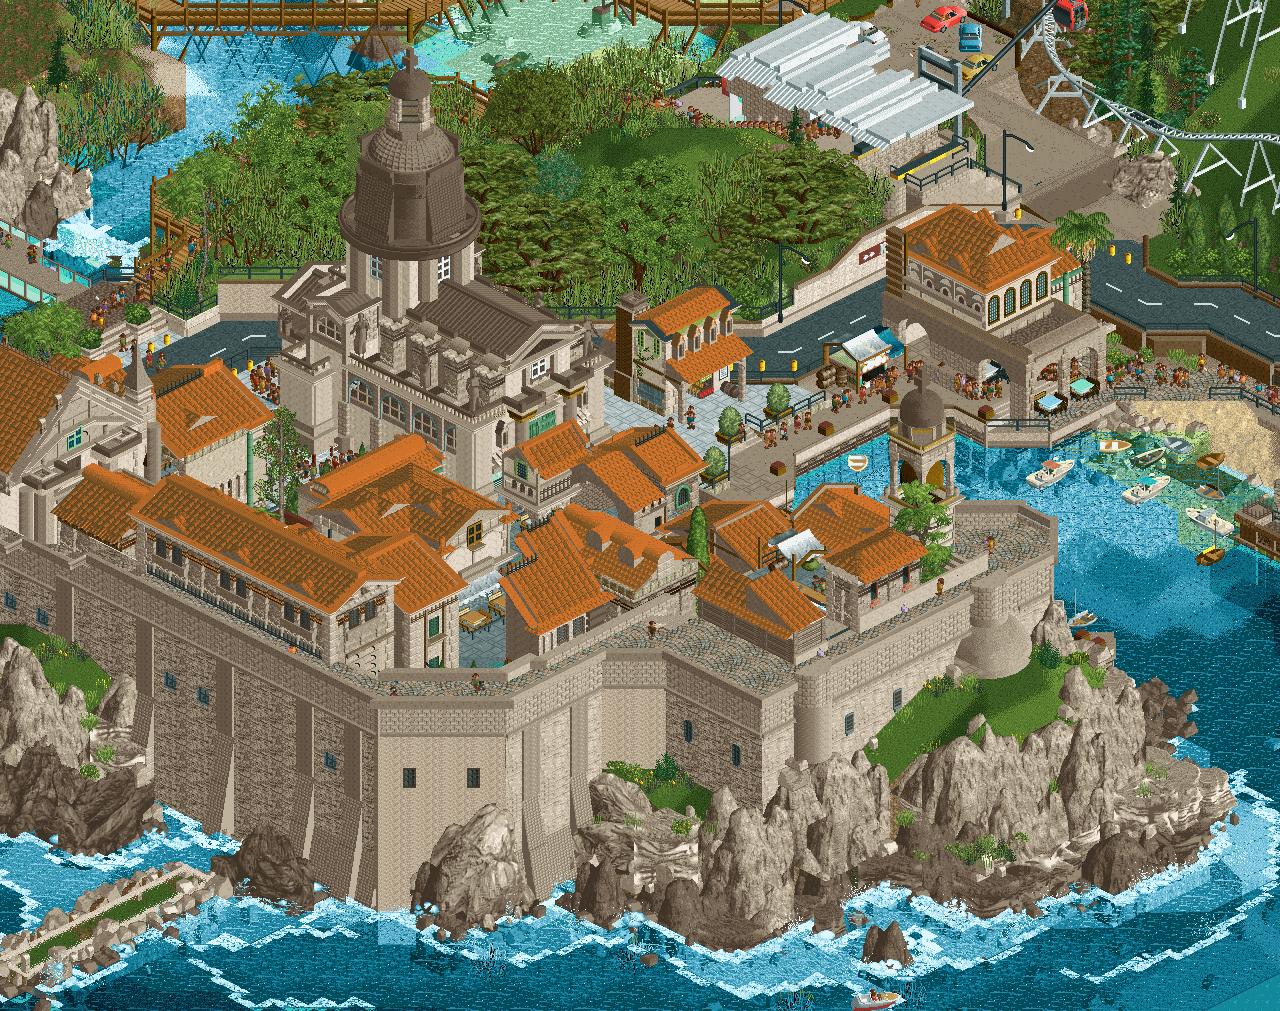 screen_6521 The Walls of Dubrovnik - Domovina